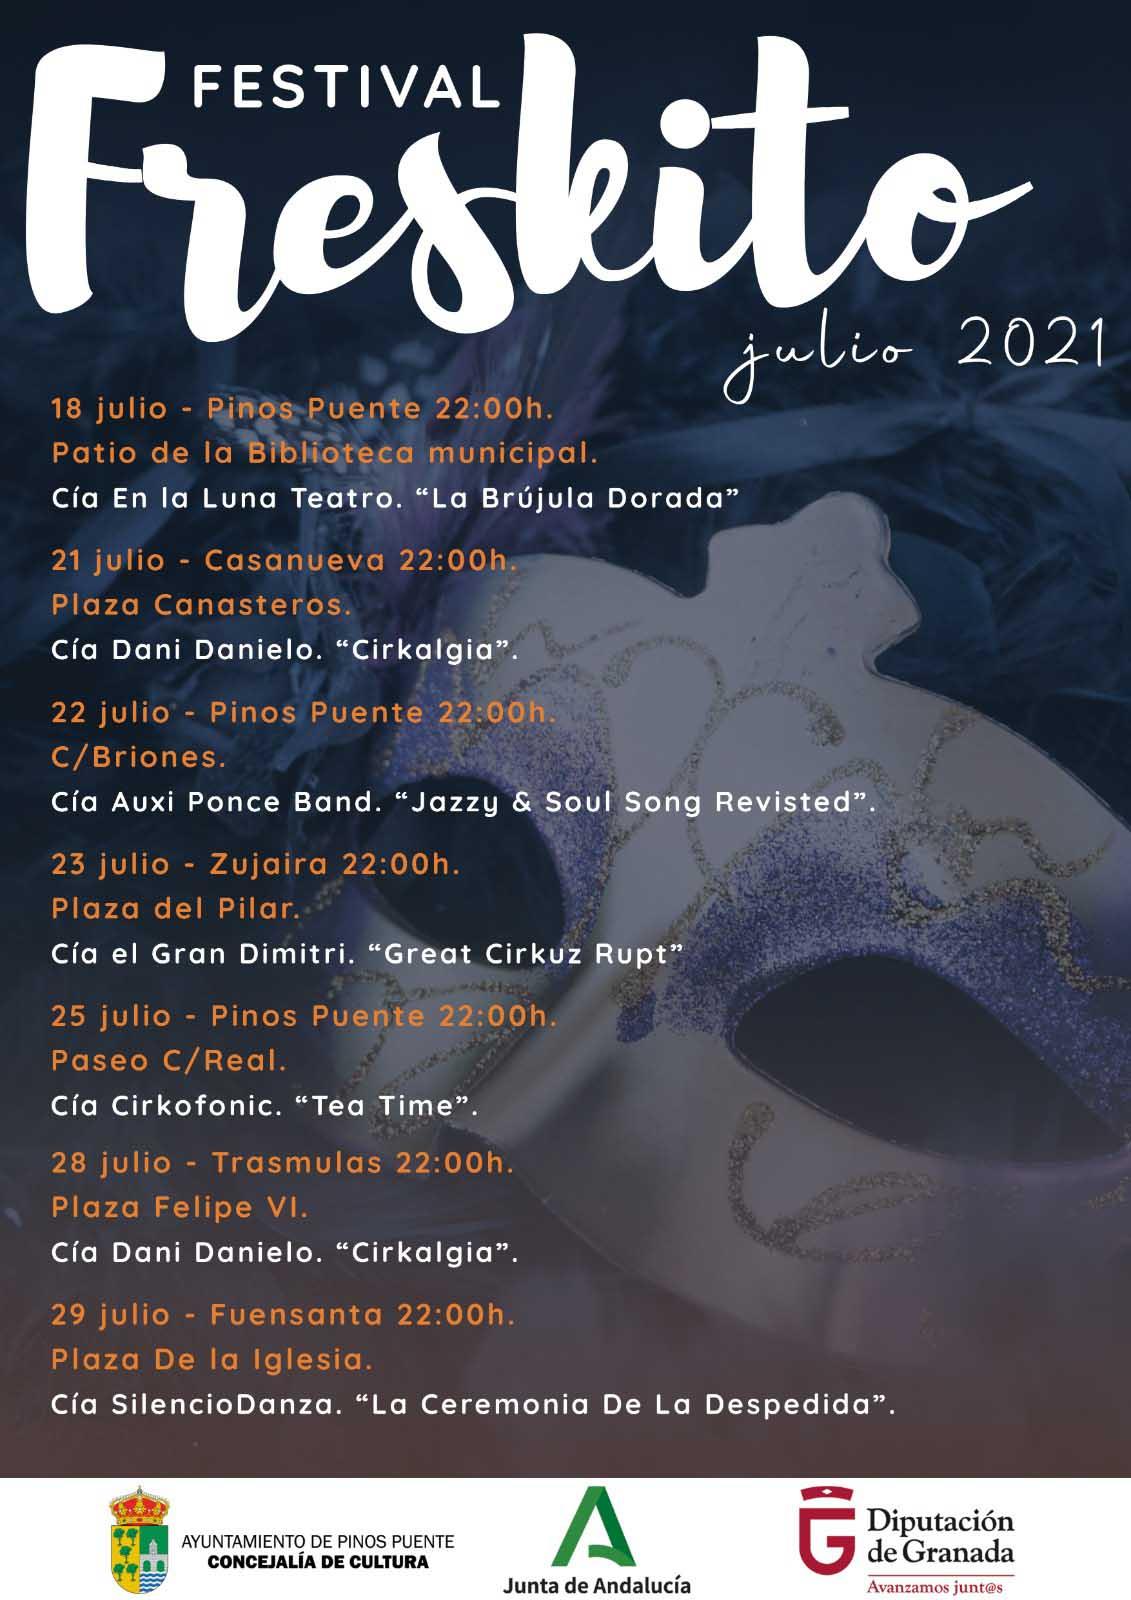 Festival Al Freskito 2021